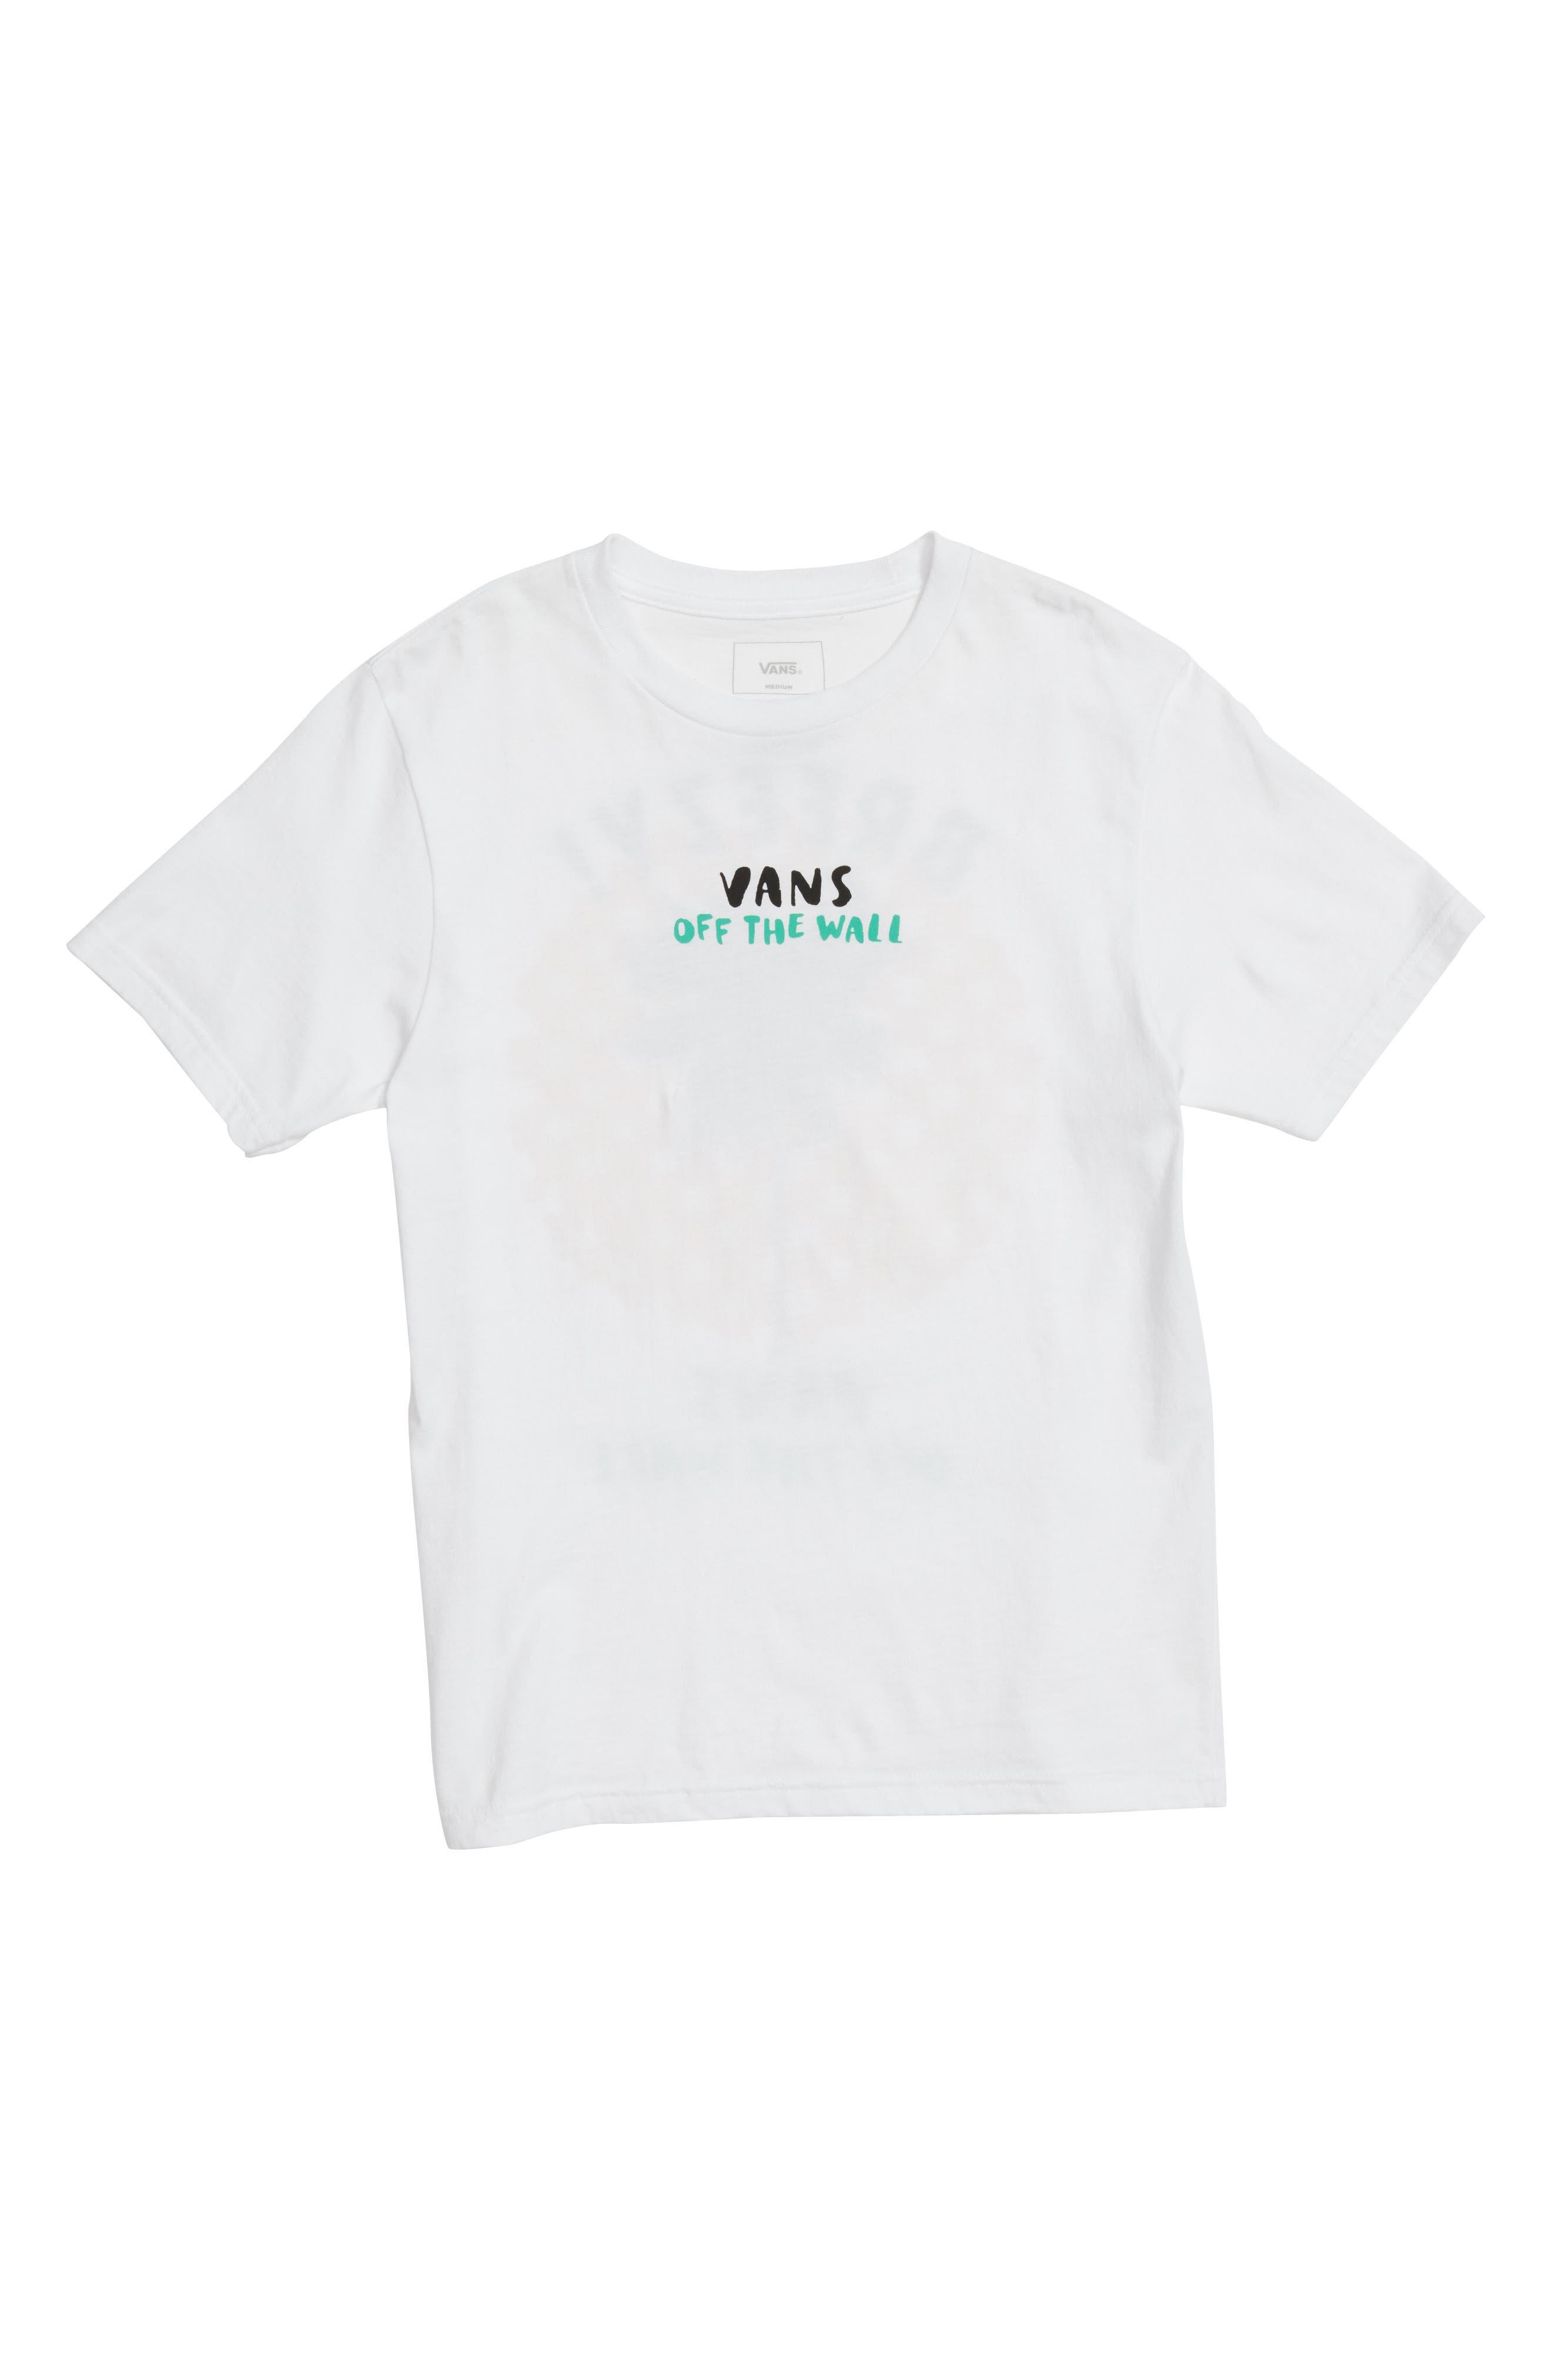 VANS Stay Breezy Graphic T-Shirt, Main, color, 100